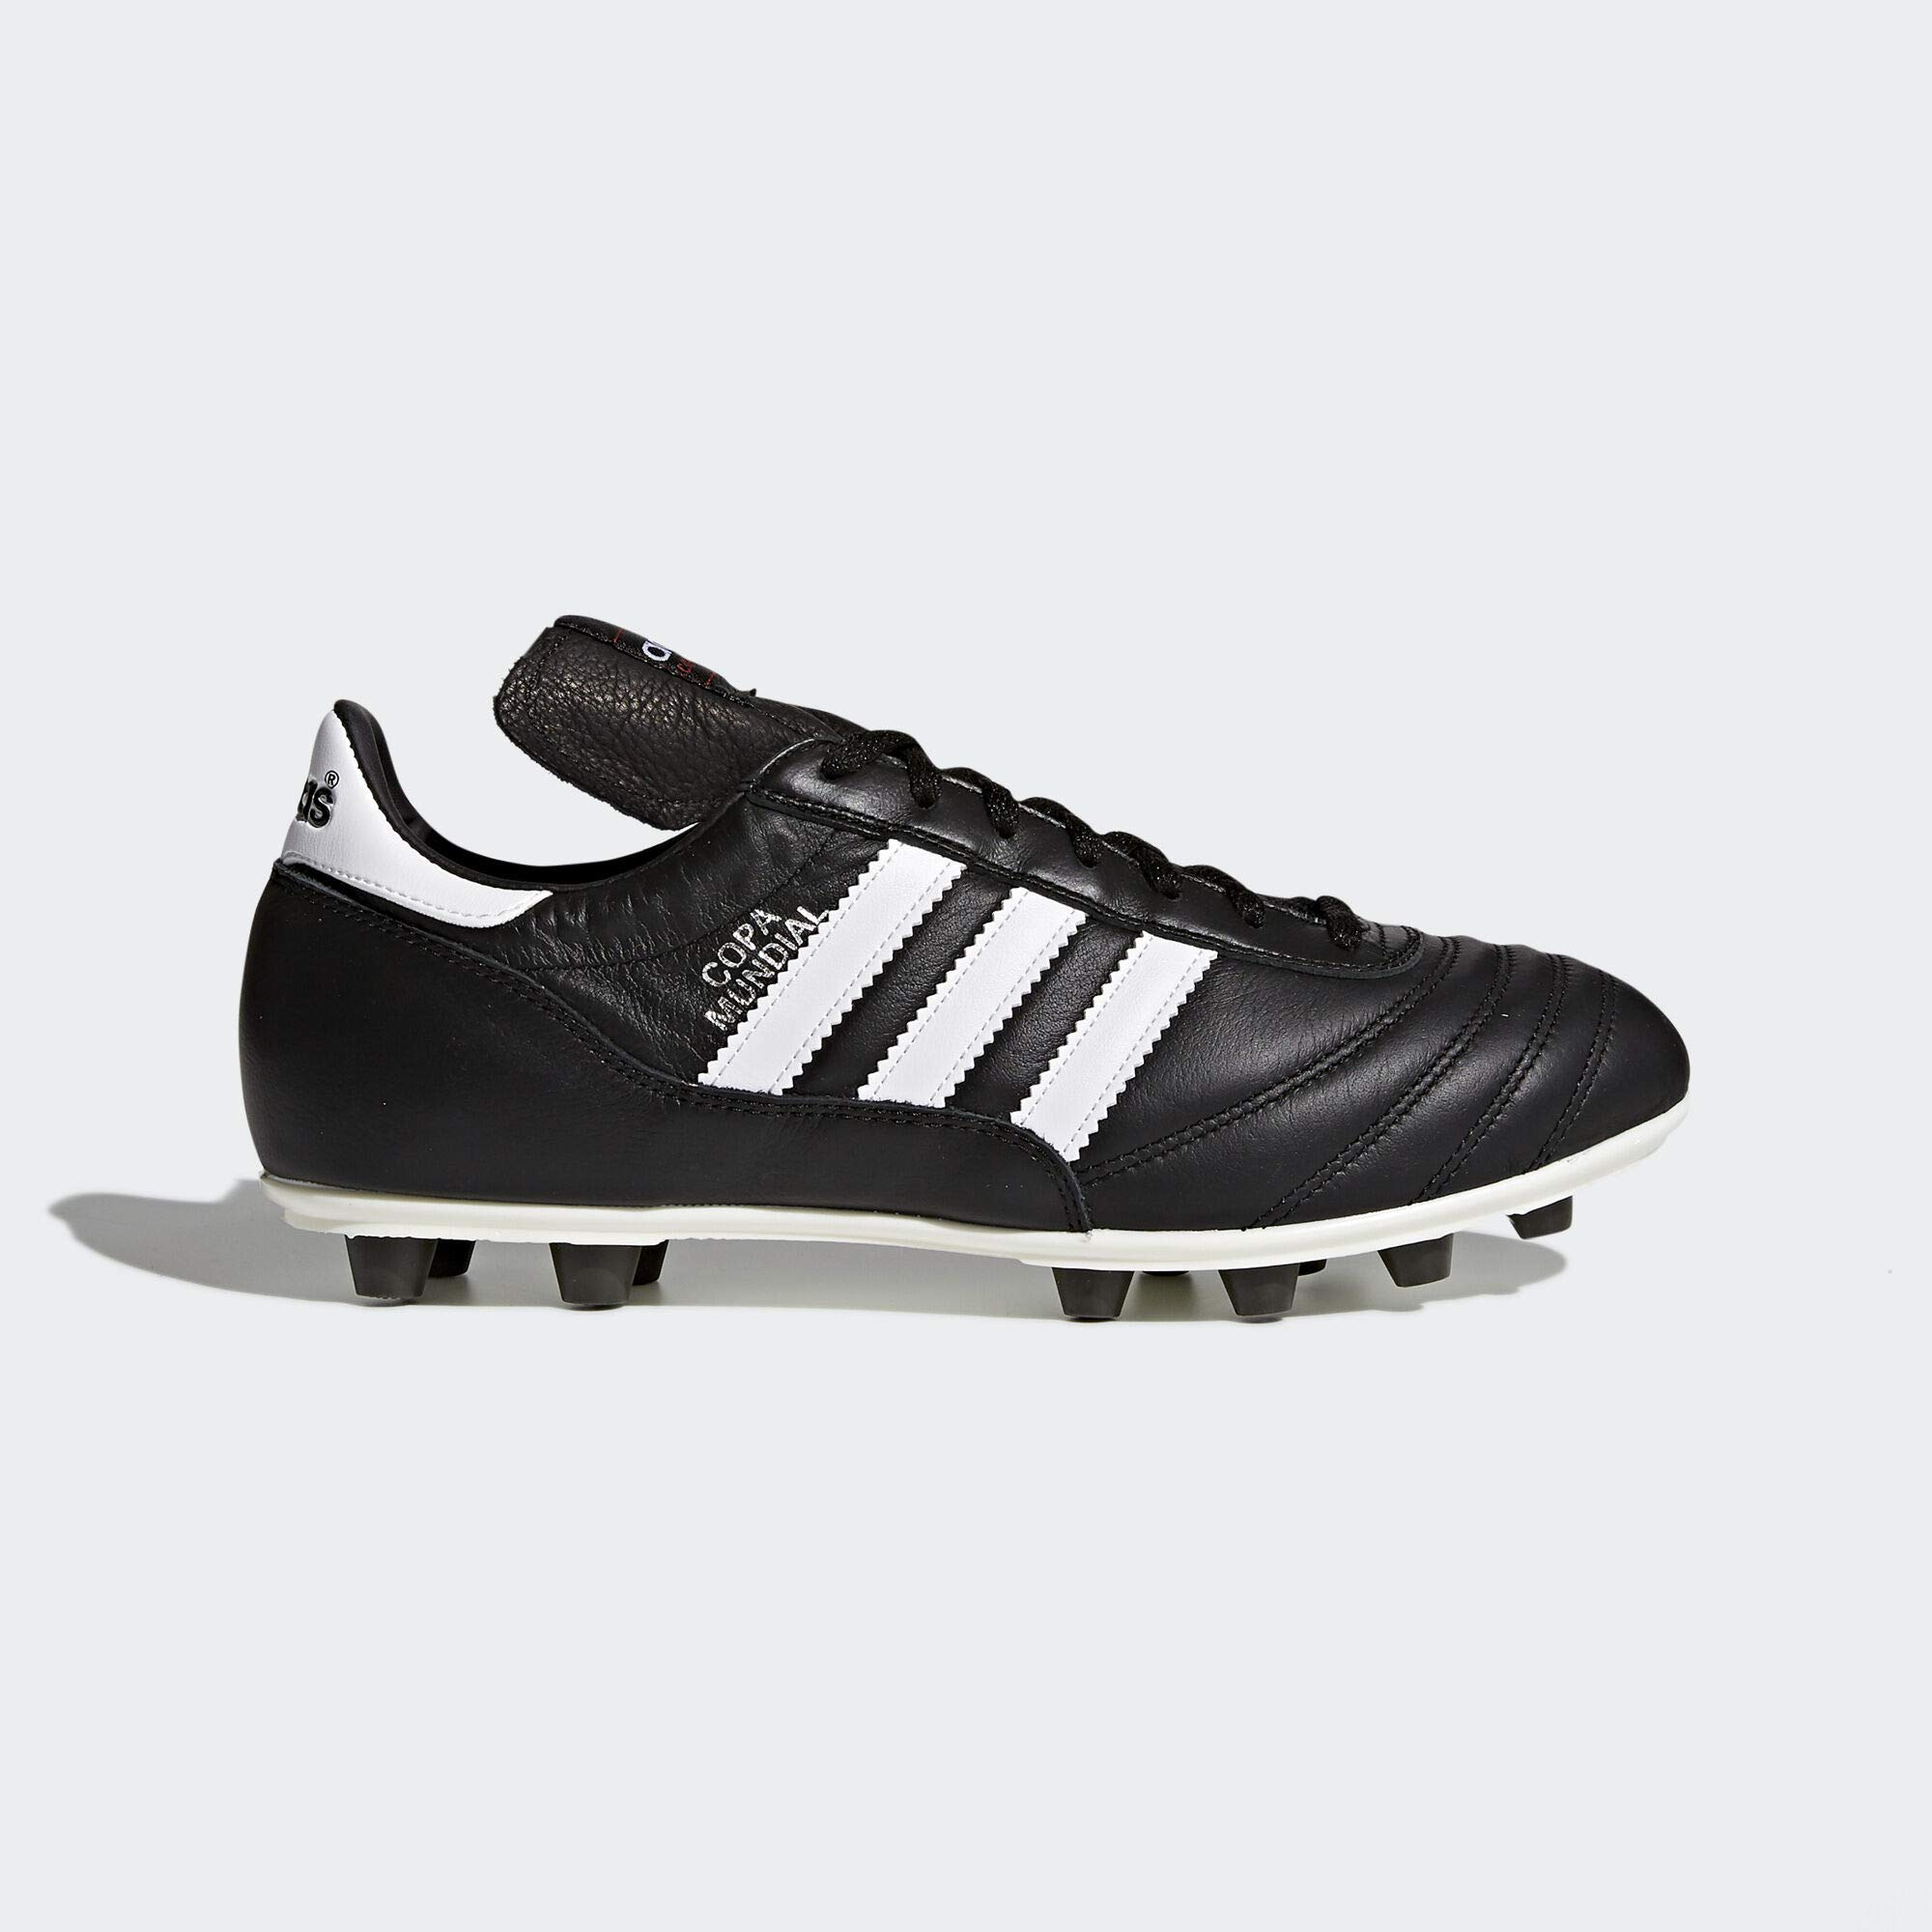 adidas Performance Men's Copa Mundial Soccer Shoe,Black/White/Black,8 M US by adidas